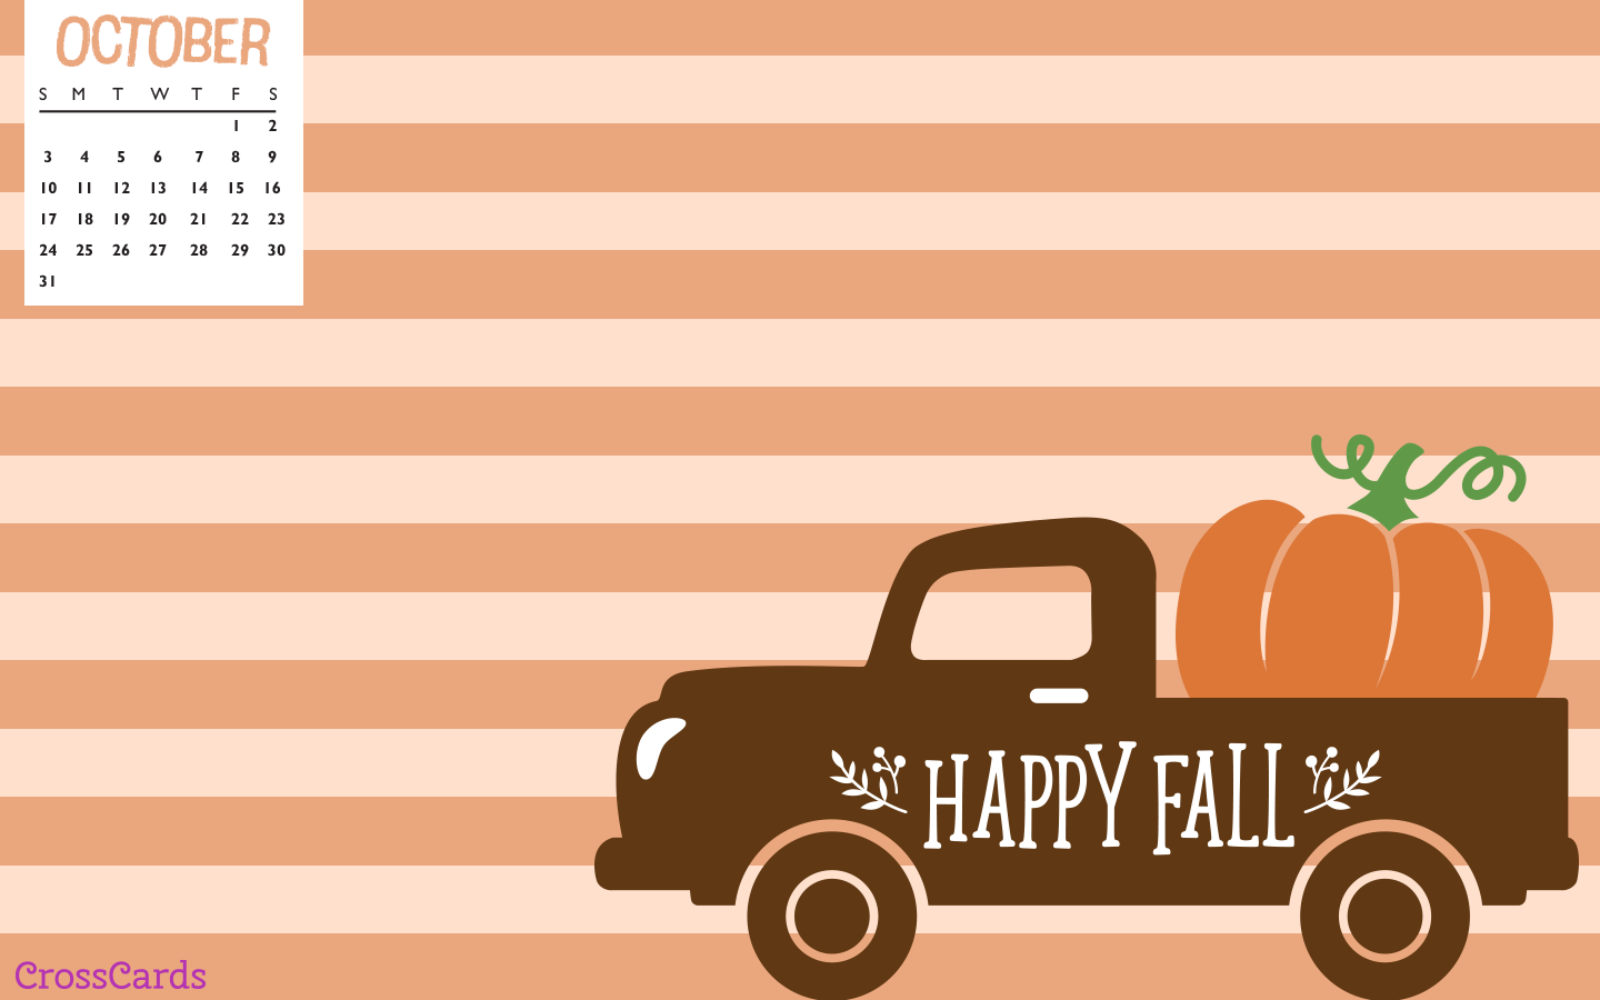 October 2021 - Happy Fall! mobile phone wallpaper